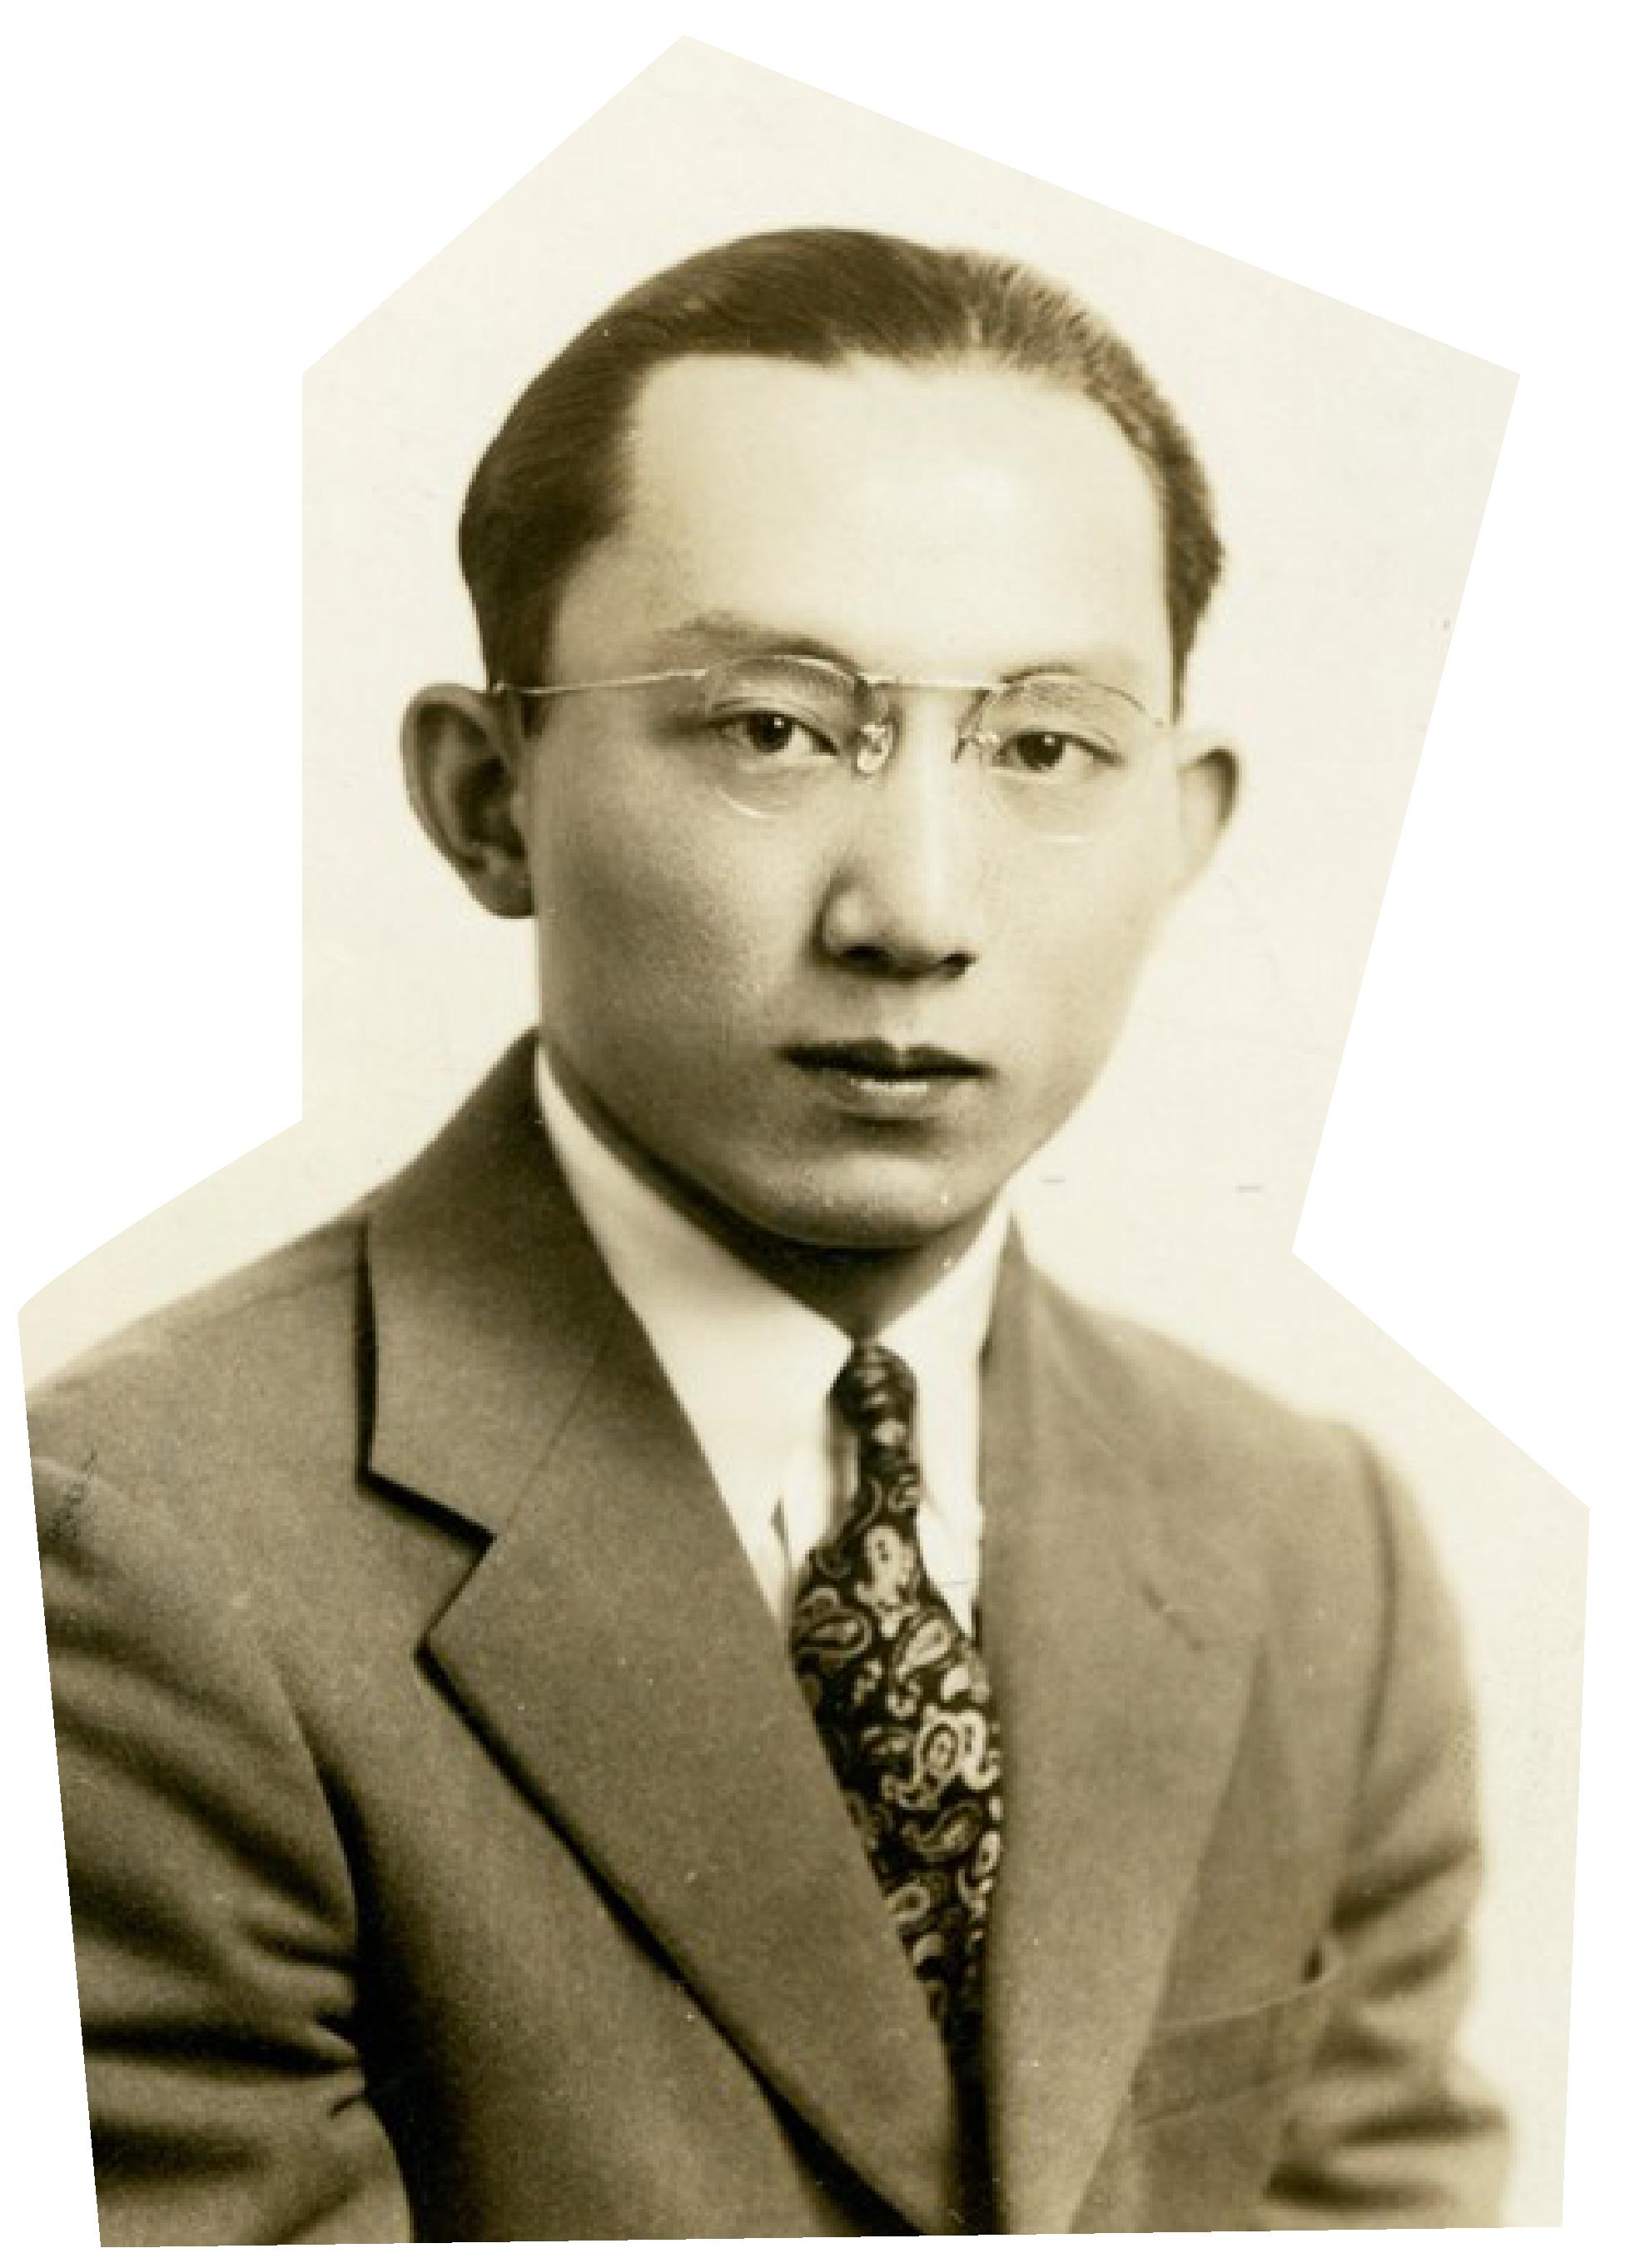 Kentaro Ikeda '44, a Japanese student at Princeton in the 1940s.